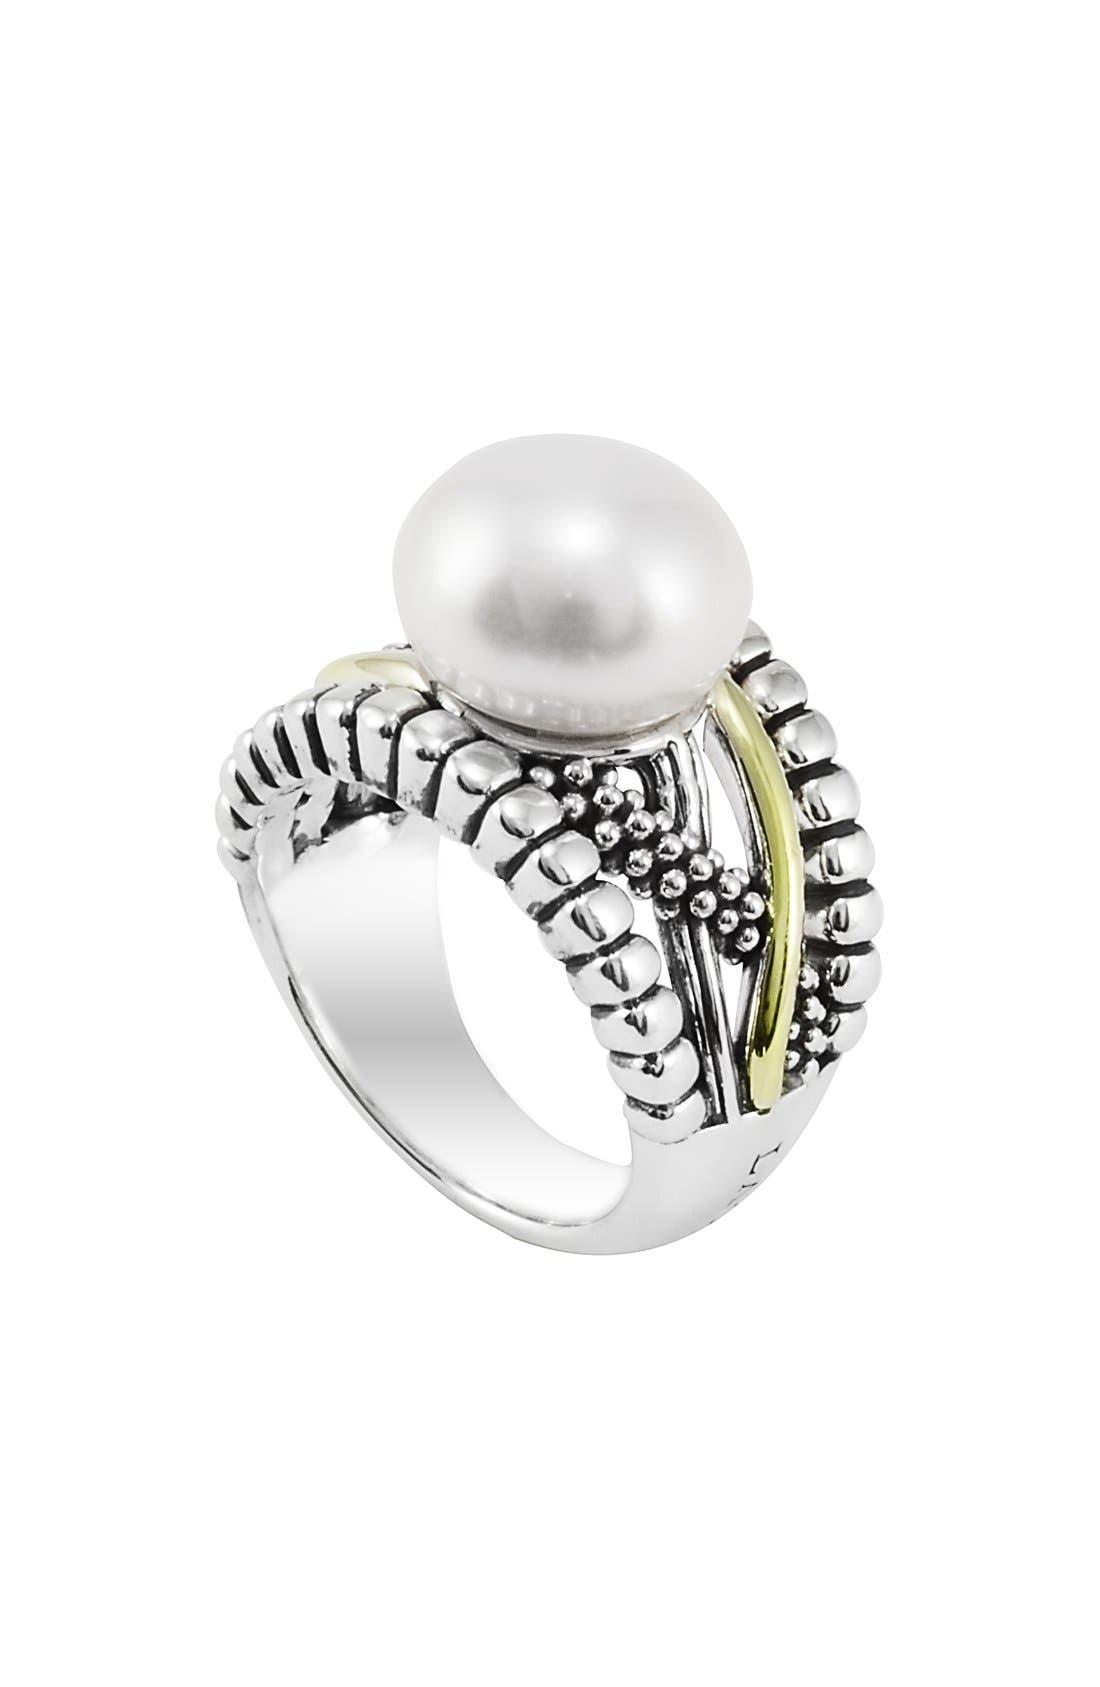 Main Image - LAGOS 'Luna - Unlaced' Pearl Ring